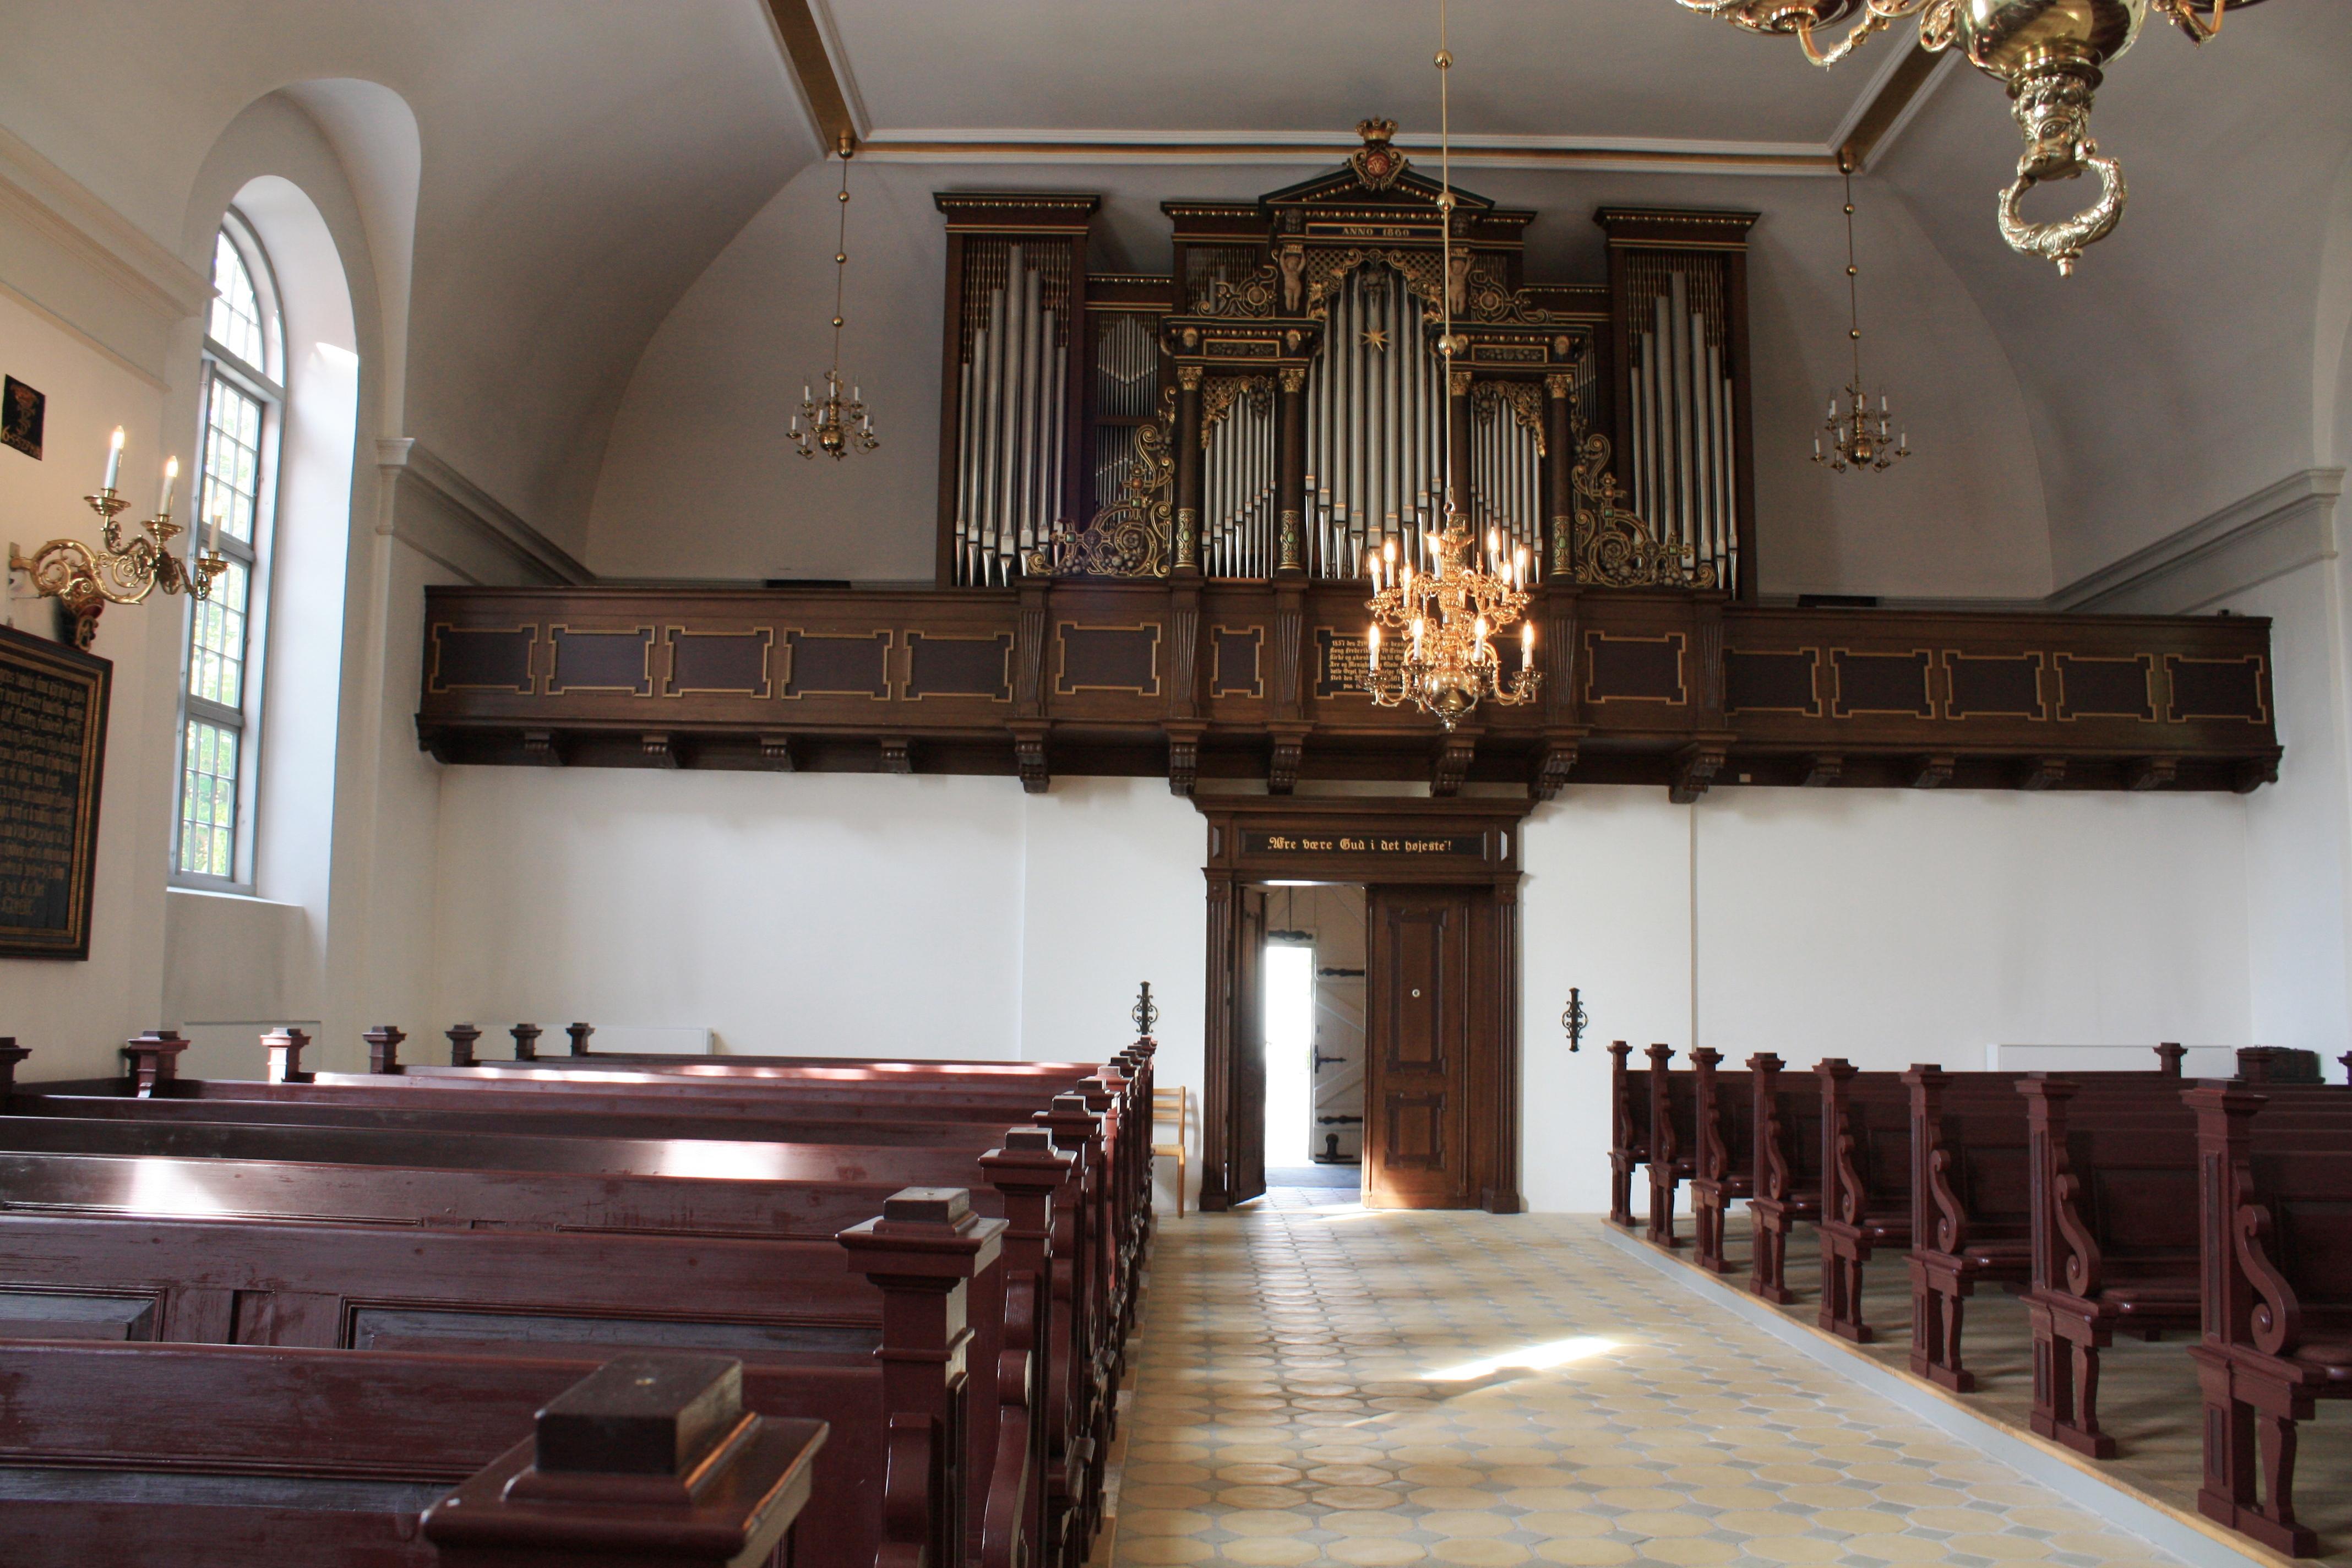 File:Trinitatis kirke IM7962 C.JPG.